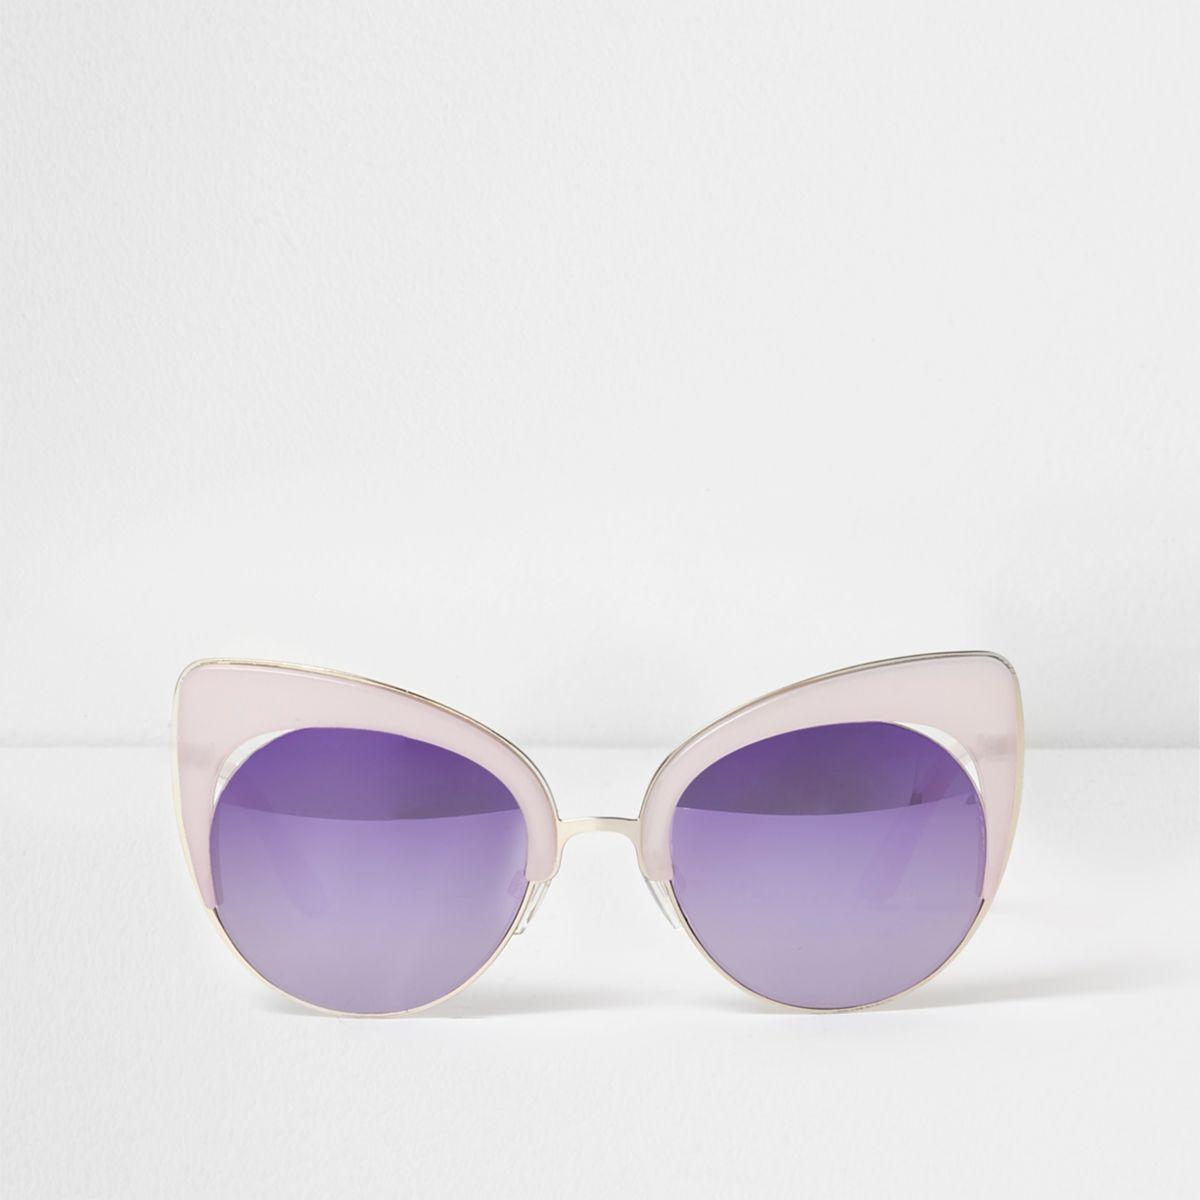 Lilac mirror lens cat eye sunglasses